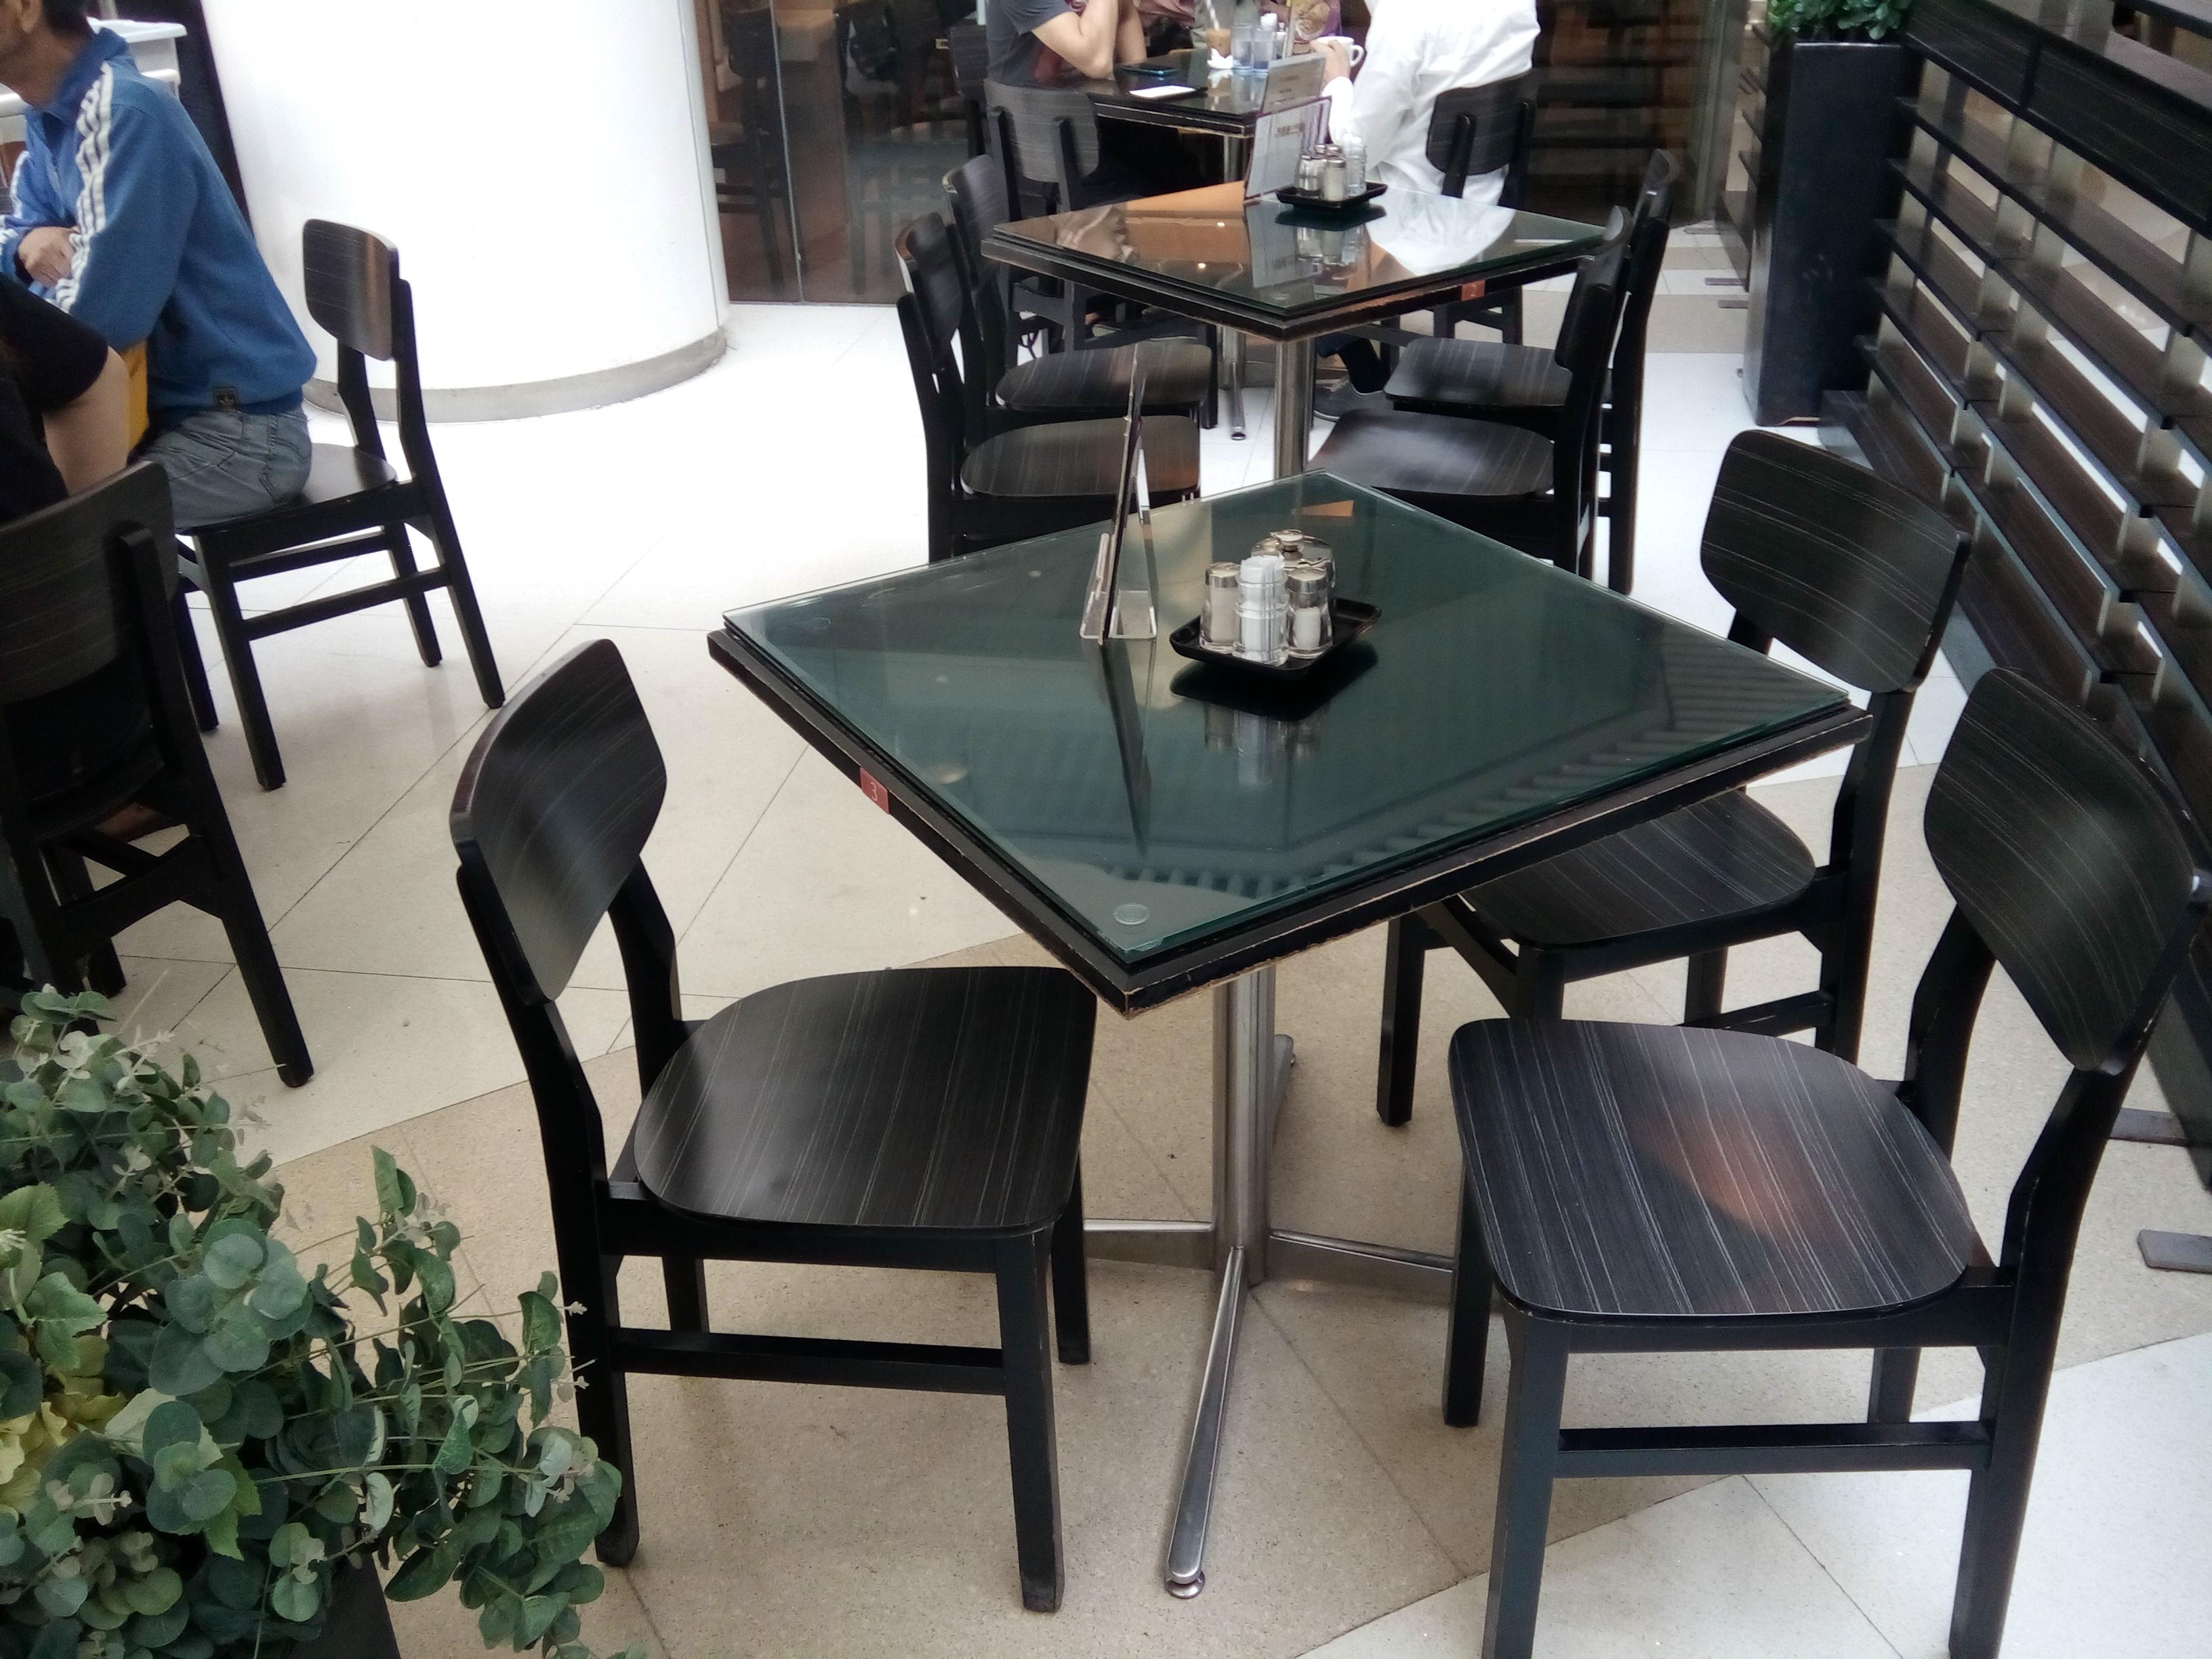 dining table and chairs hong kong grey rocking chair file hk tsw 天水圍 tin shui wai 天恩路 yan road 嘉湖銀座 kingswood ginza mall restaurant 美心香港地 maxim s day furniture n dec